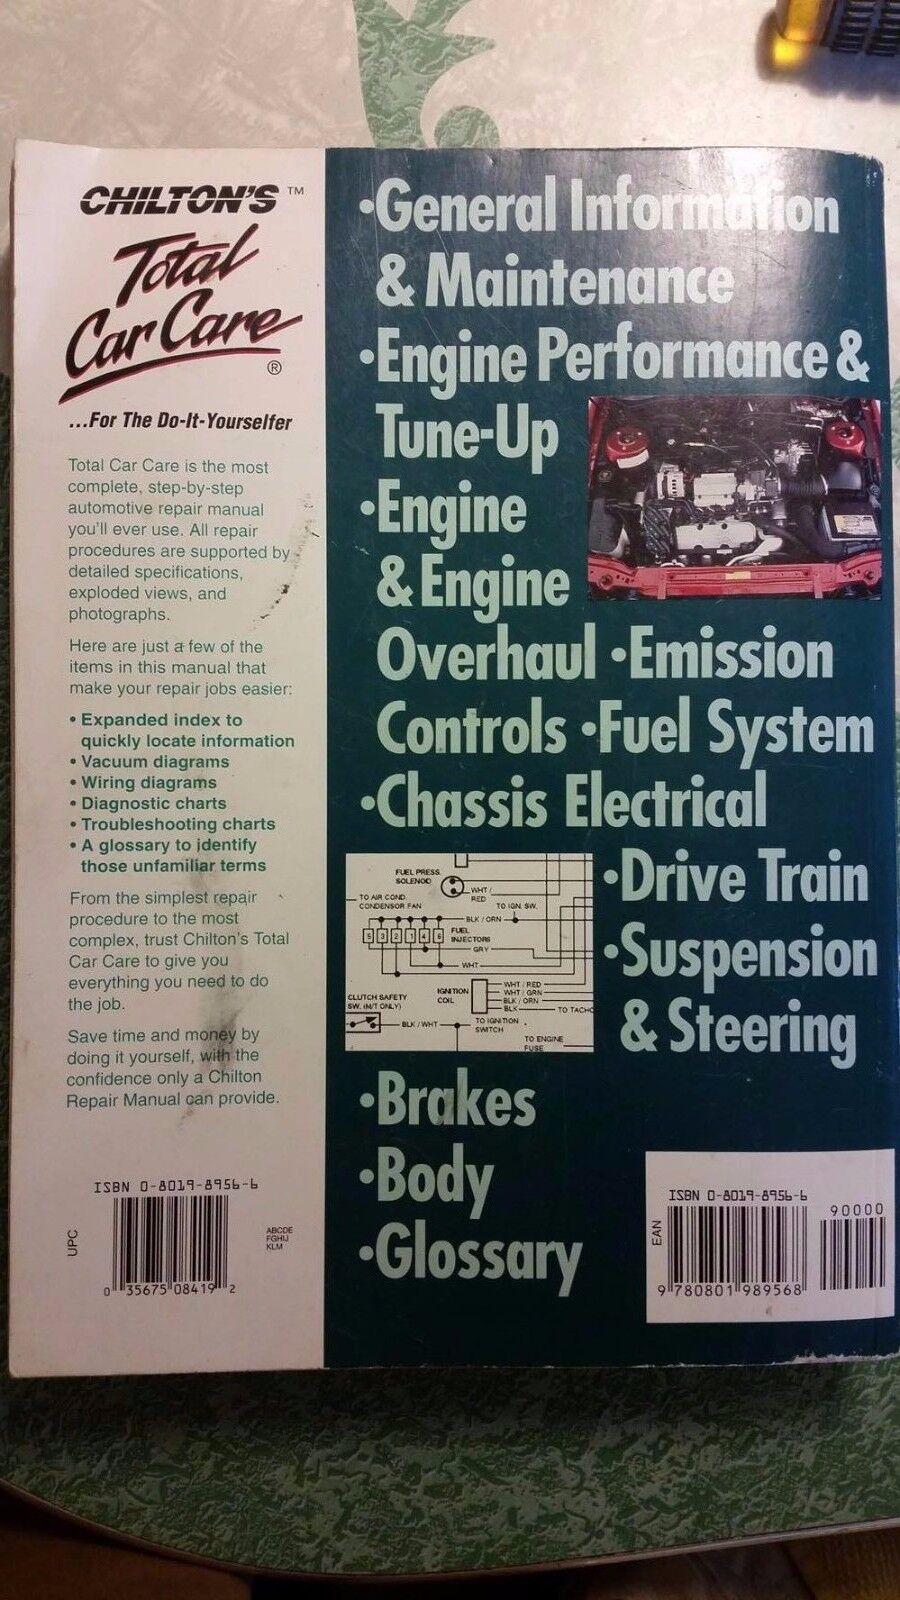 Saturn Coupes Sedans Wagons 1991 Thru 1998 Chilton Repair Manual Sw1 Engine Diagram 62300 Ebay